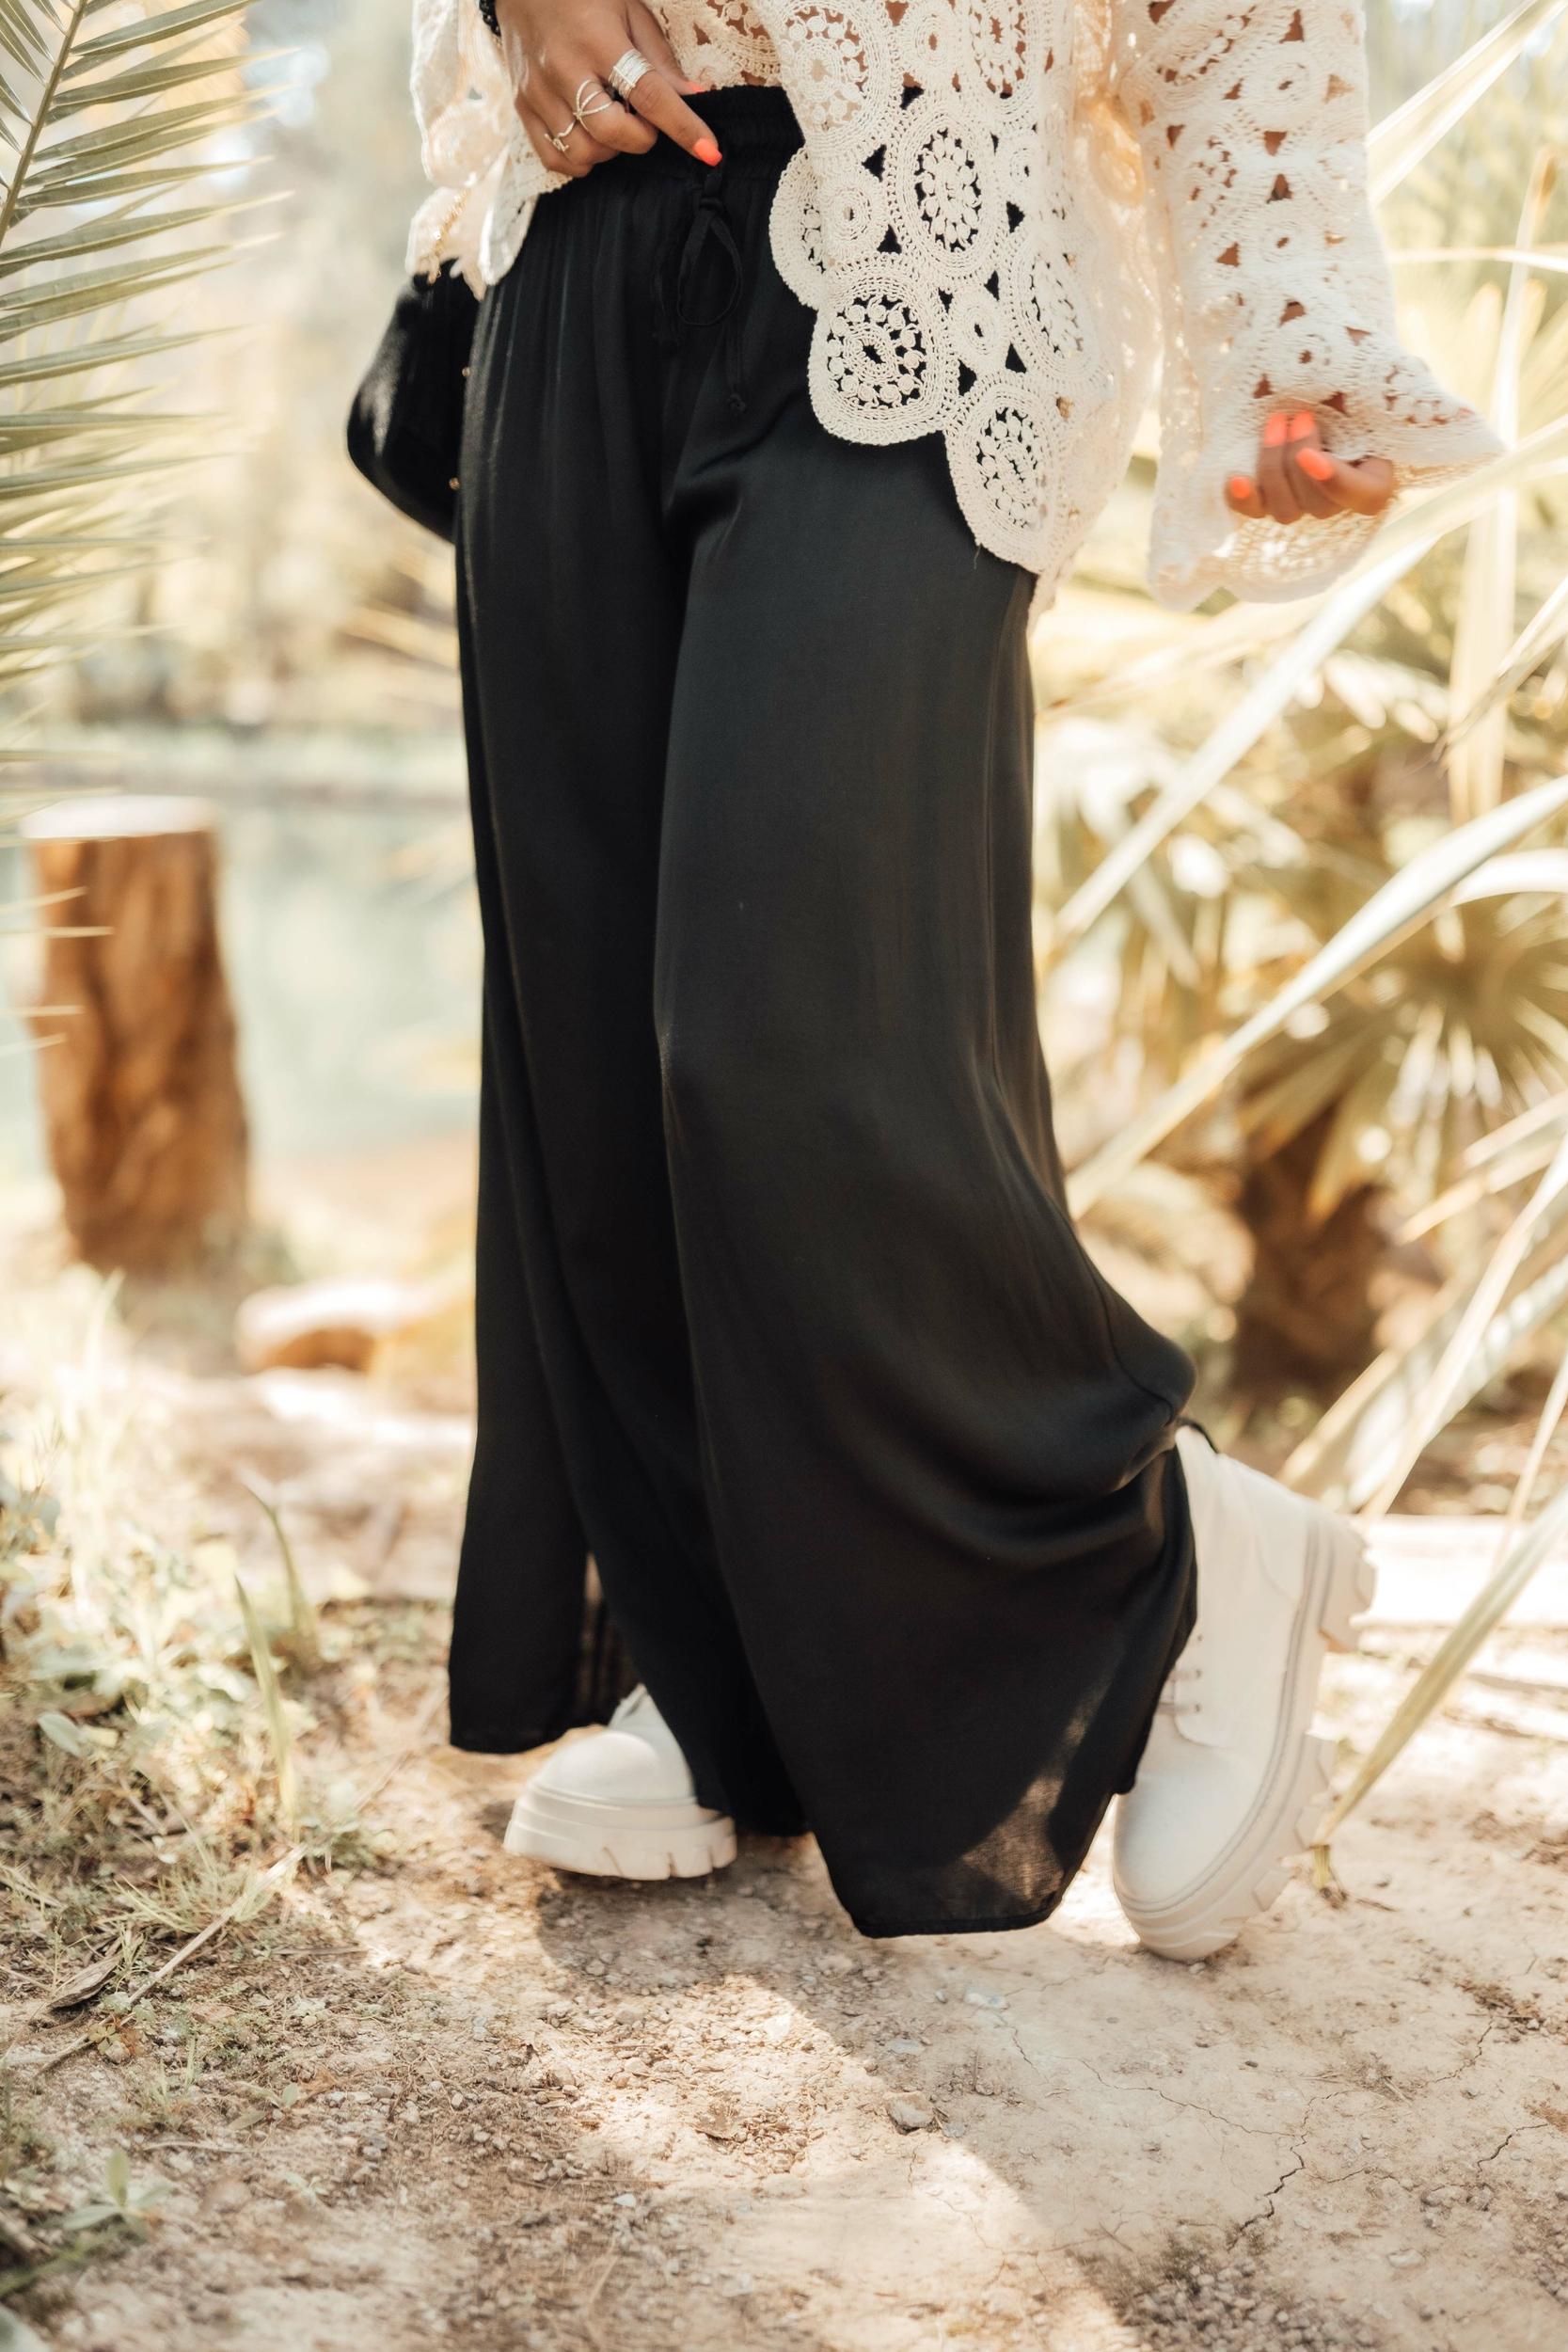 pantalon_guava_noir_chantalbtf-193